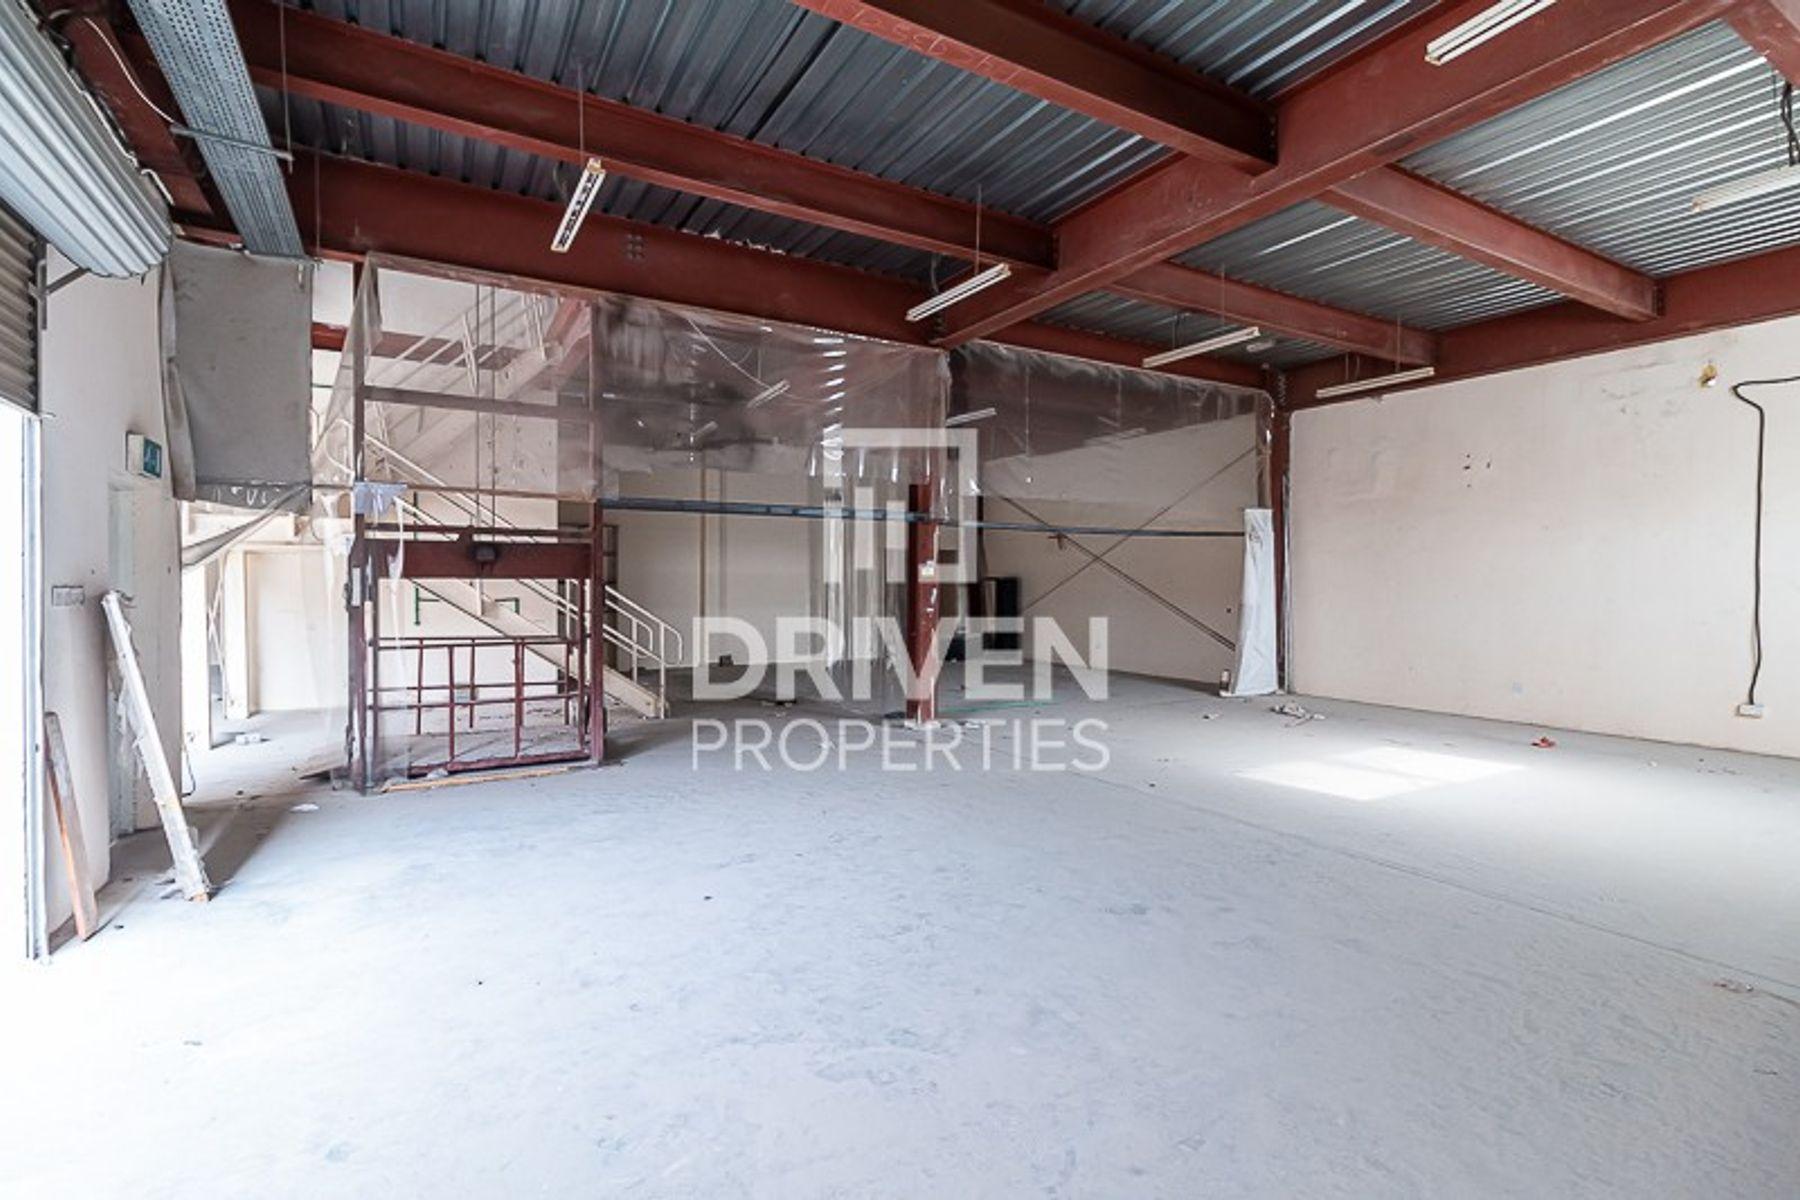 Well-managed Warehouse w/ Mezzanine Floor